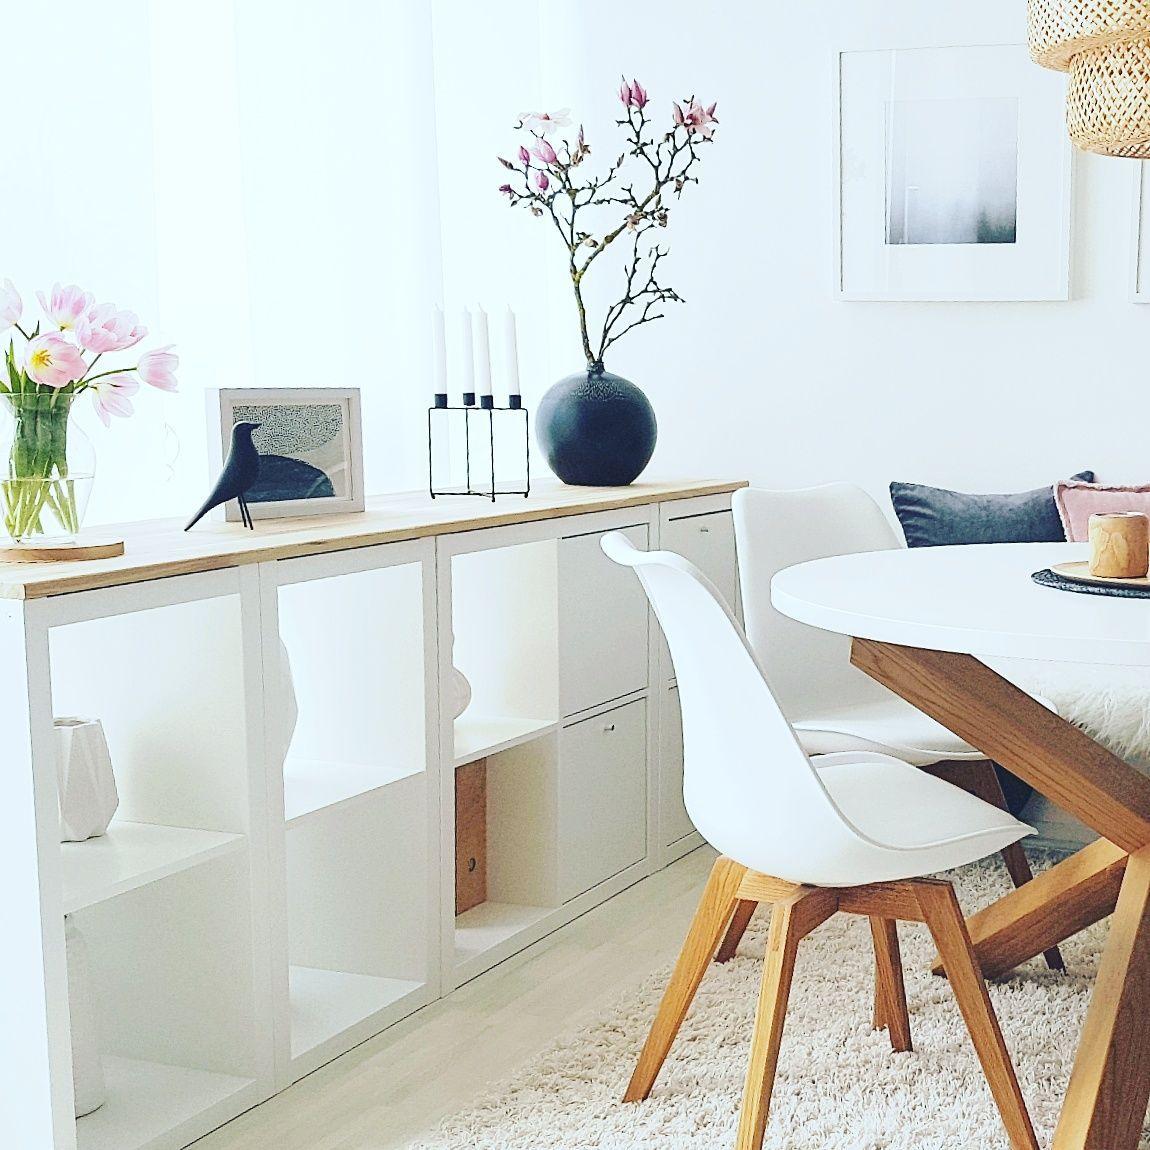 die ikea kallax serie seite 2. Black Bedroom Furniture Sets. Home Design Ideas